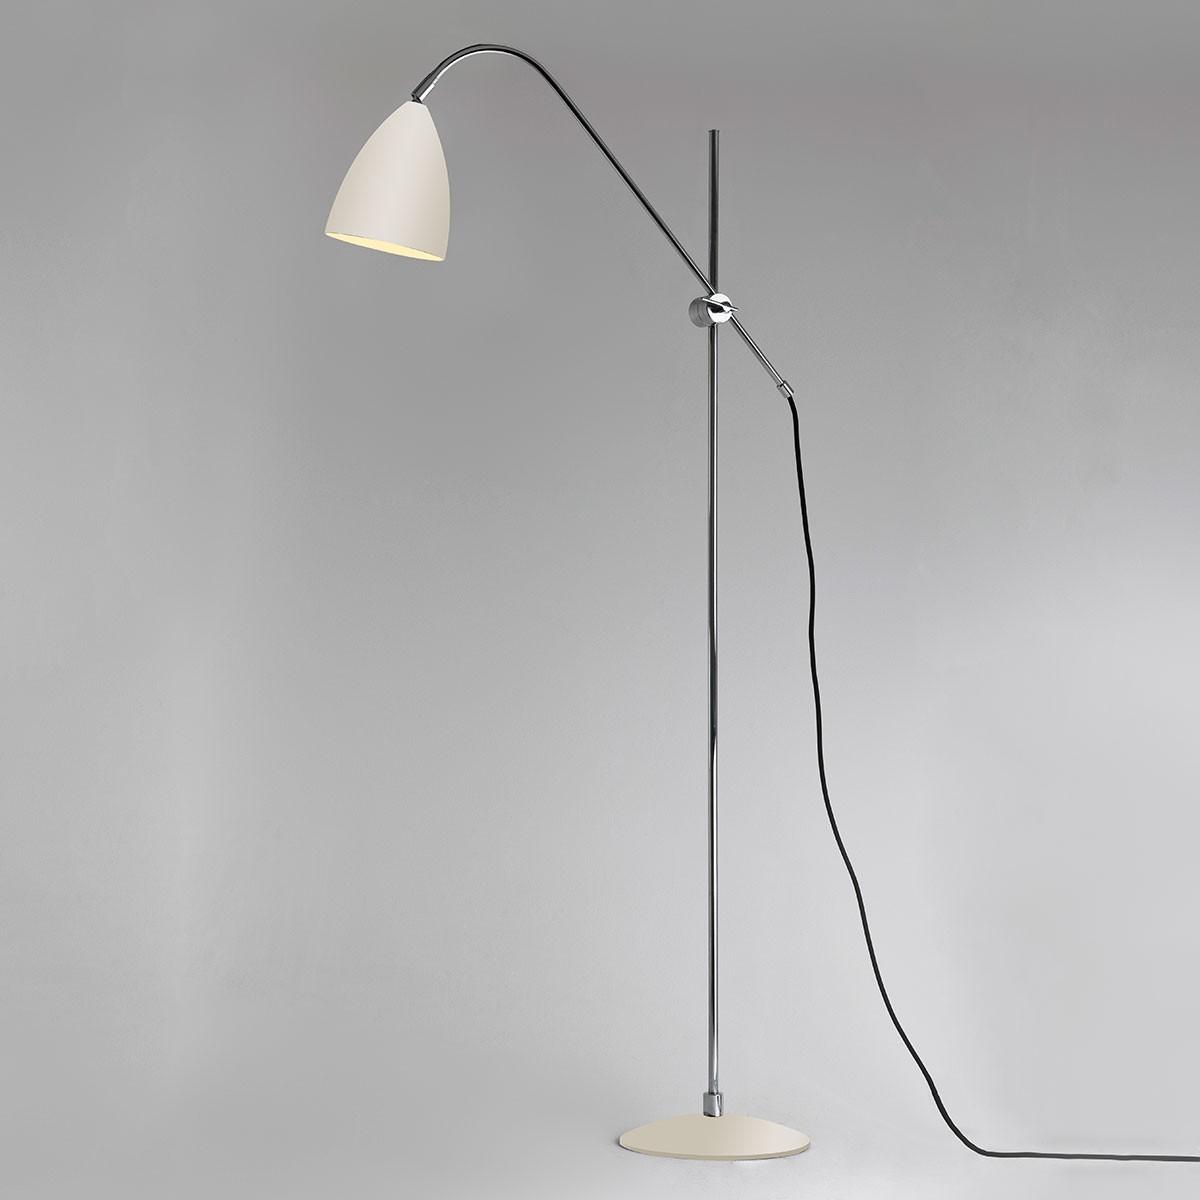 Astro joel cream floor lamp at uk electrical supplies astro joel cream floor lamp aloadofball Choice Image